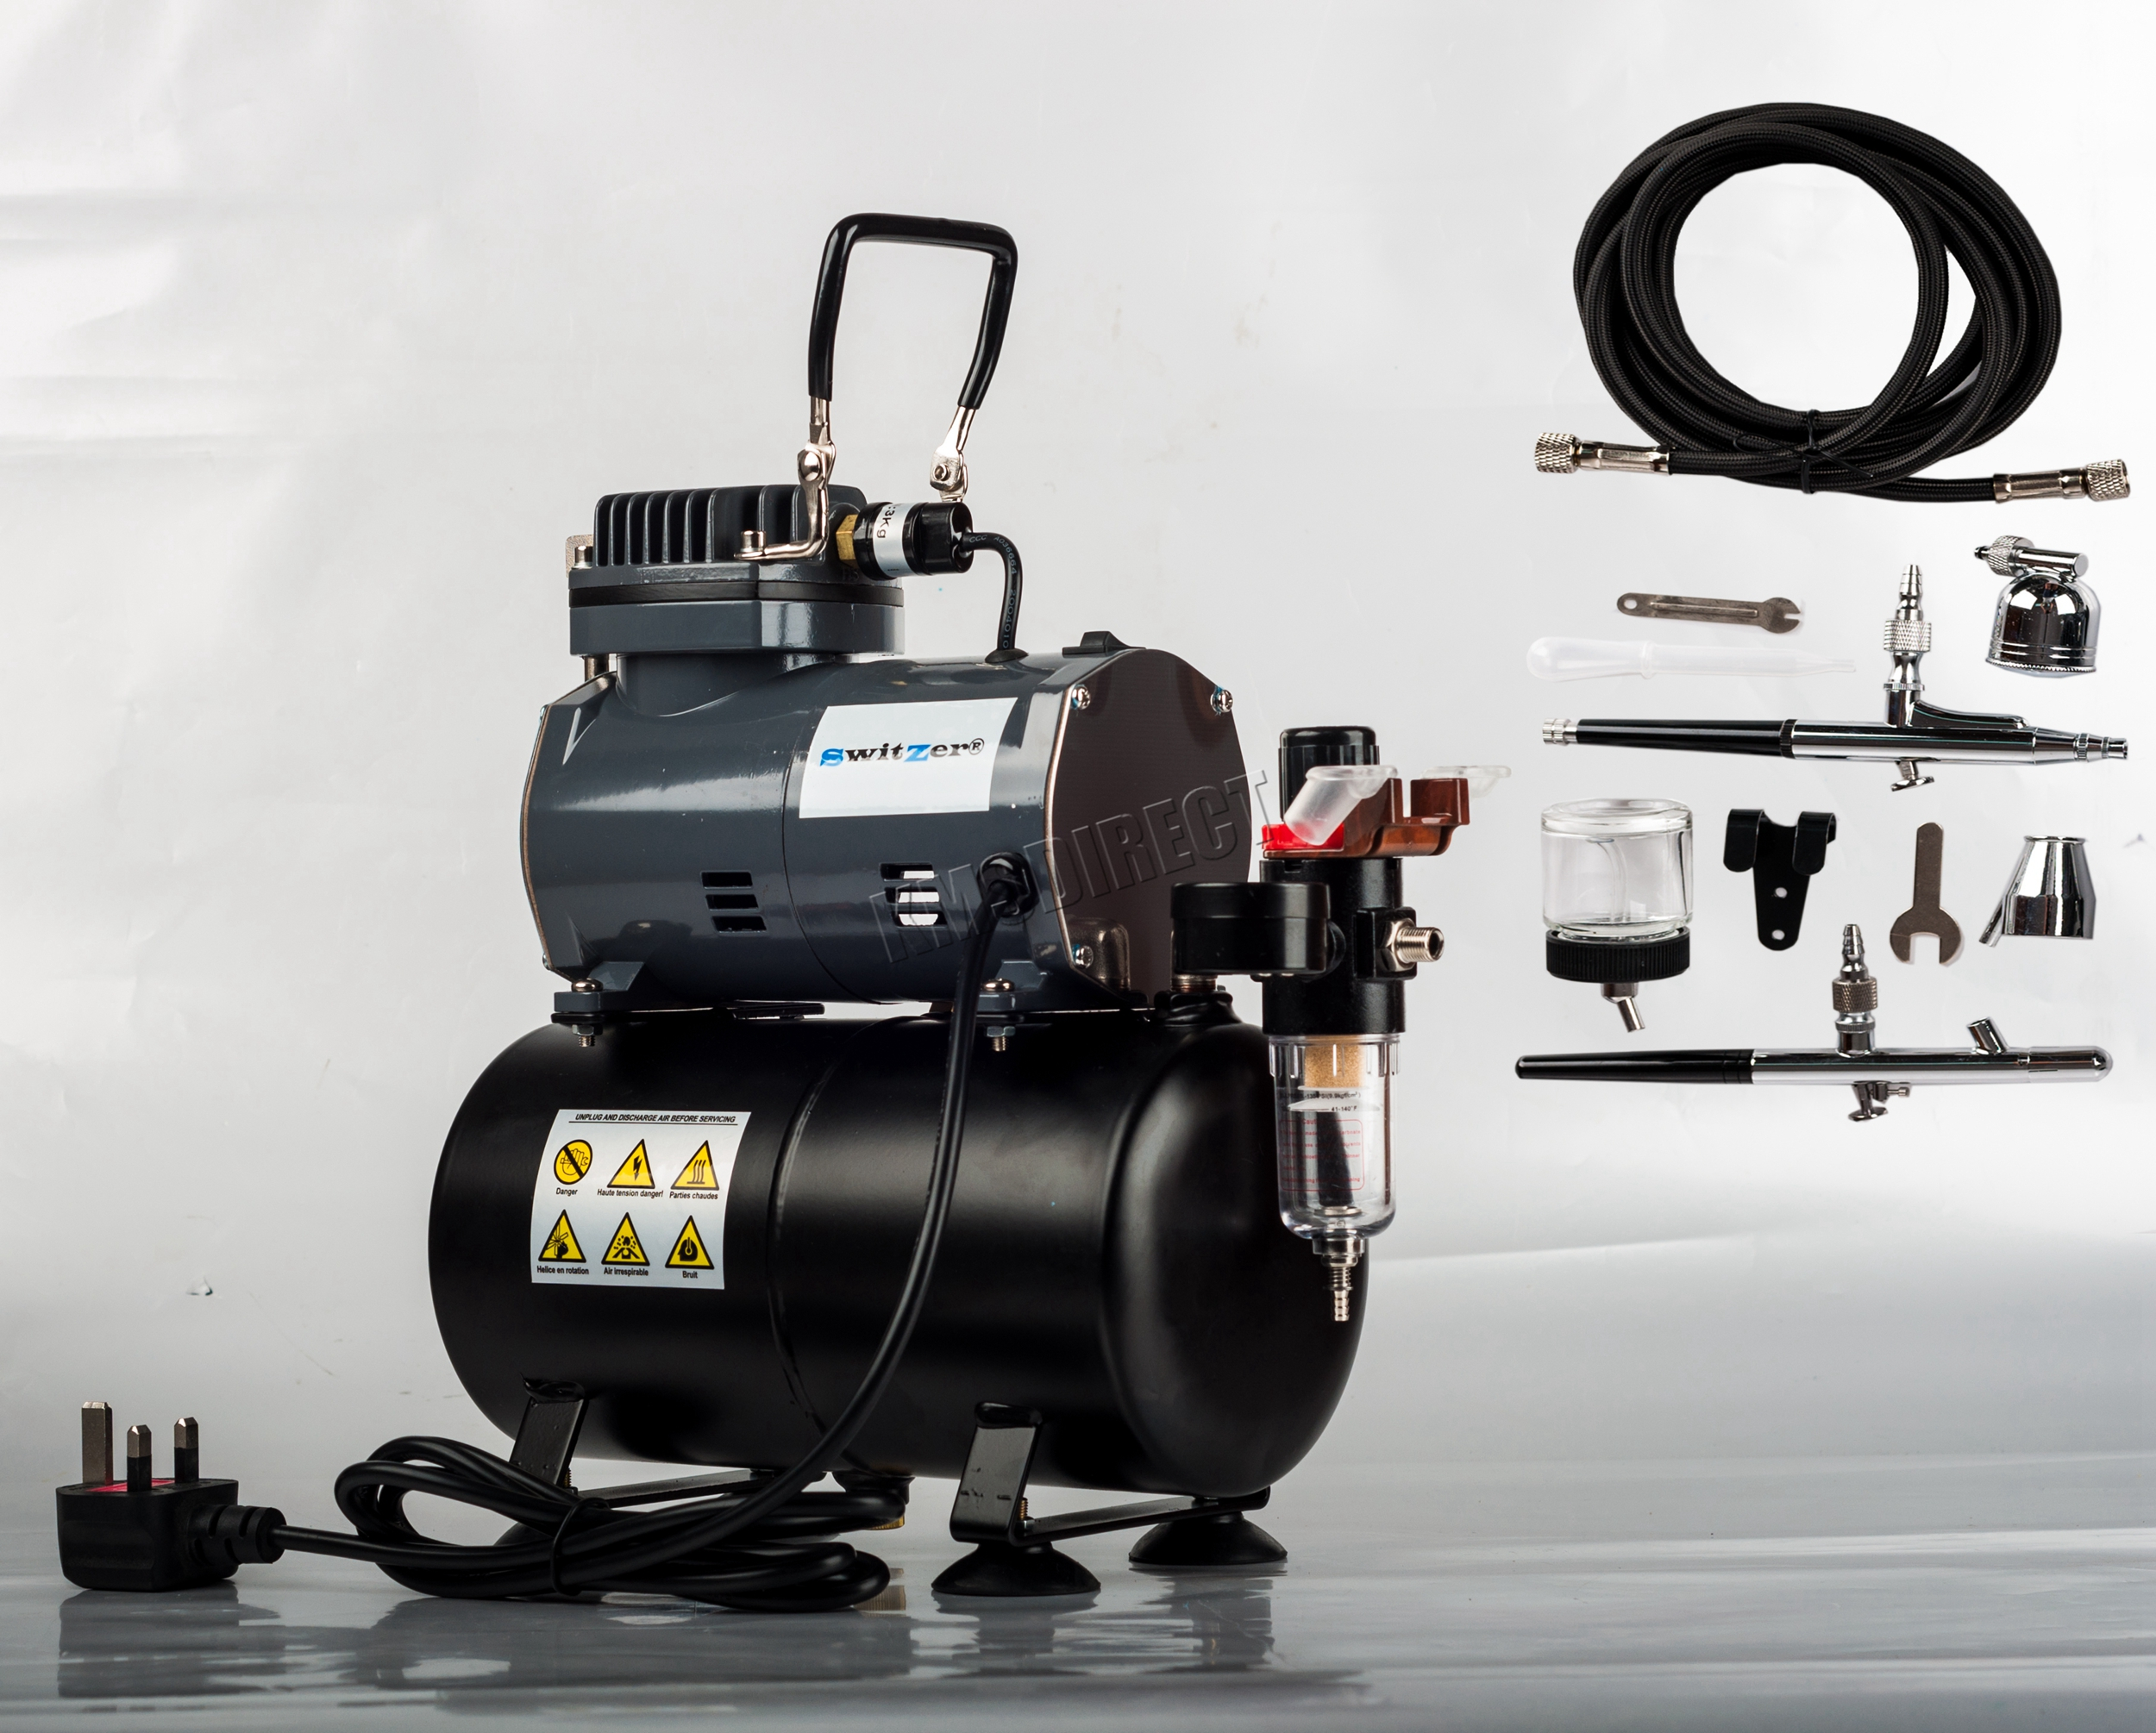 switzer kit a rographe ensemble compresseur r servoir d 39 air brosses tuyau ebay. Black Bedroom Furniture Sets. Home Design Ideas